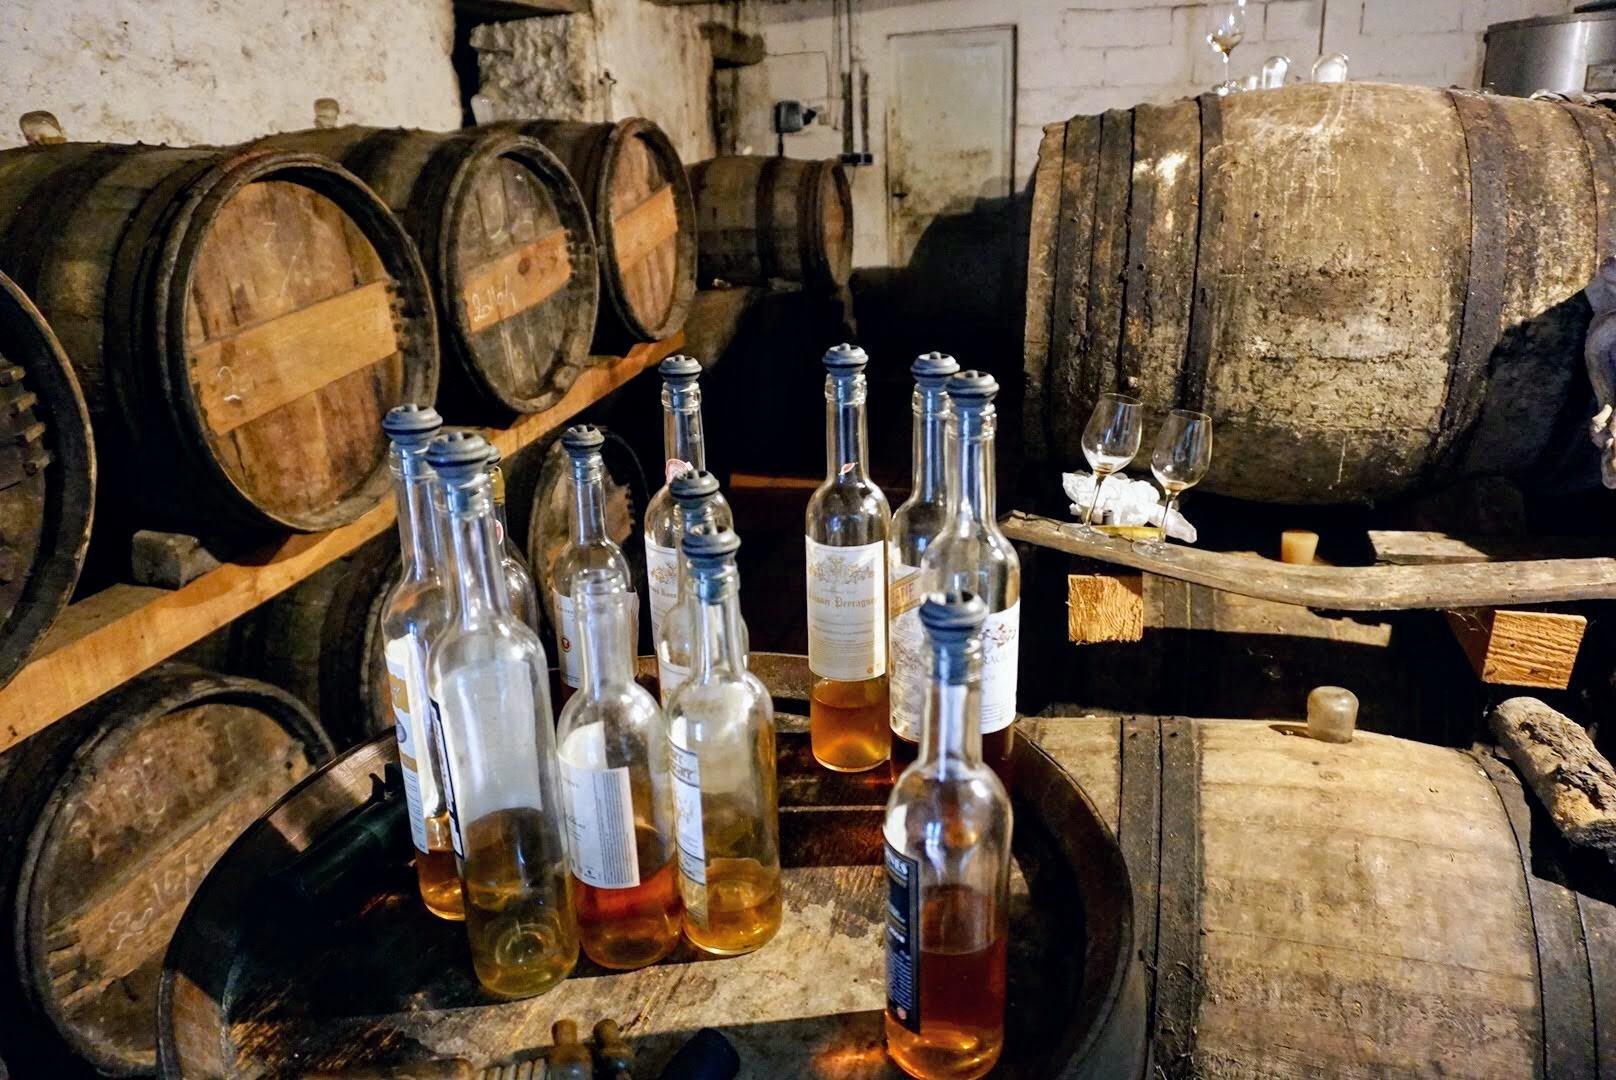 Many bottles of Sauternes wine sit on top of a wine barrel in a barrel cellar